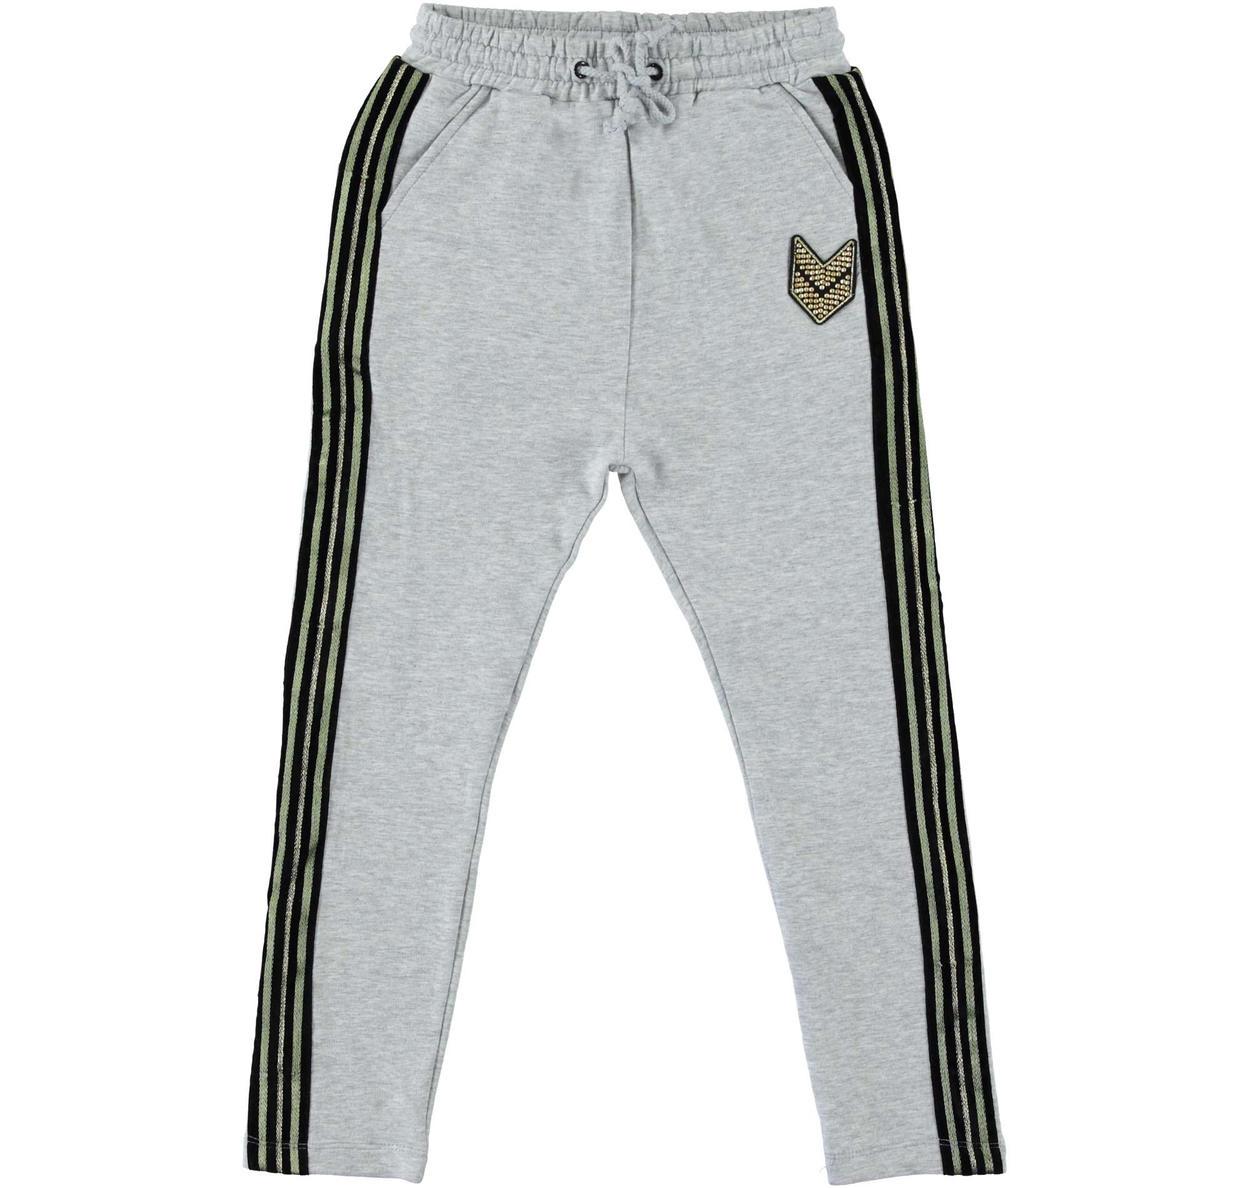 1ab440d06f11 Pantalone in felpa modello baggy fit per bambina da 6 a 16 anni Sarabanda